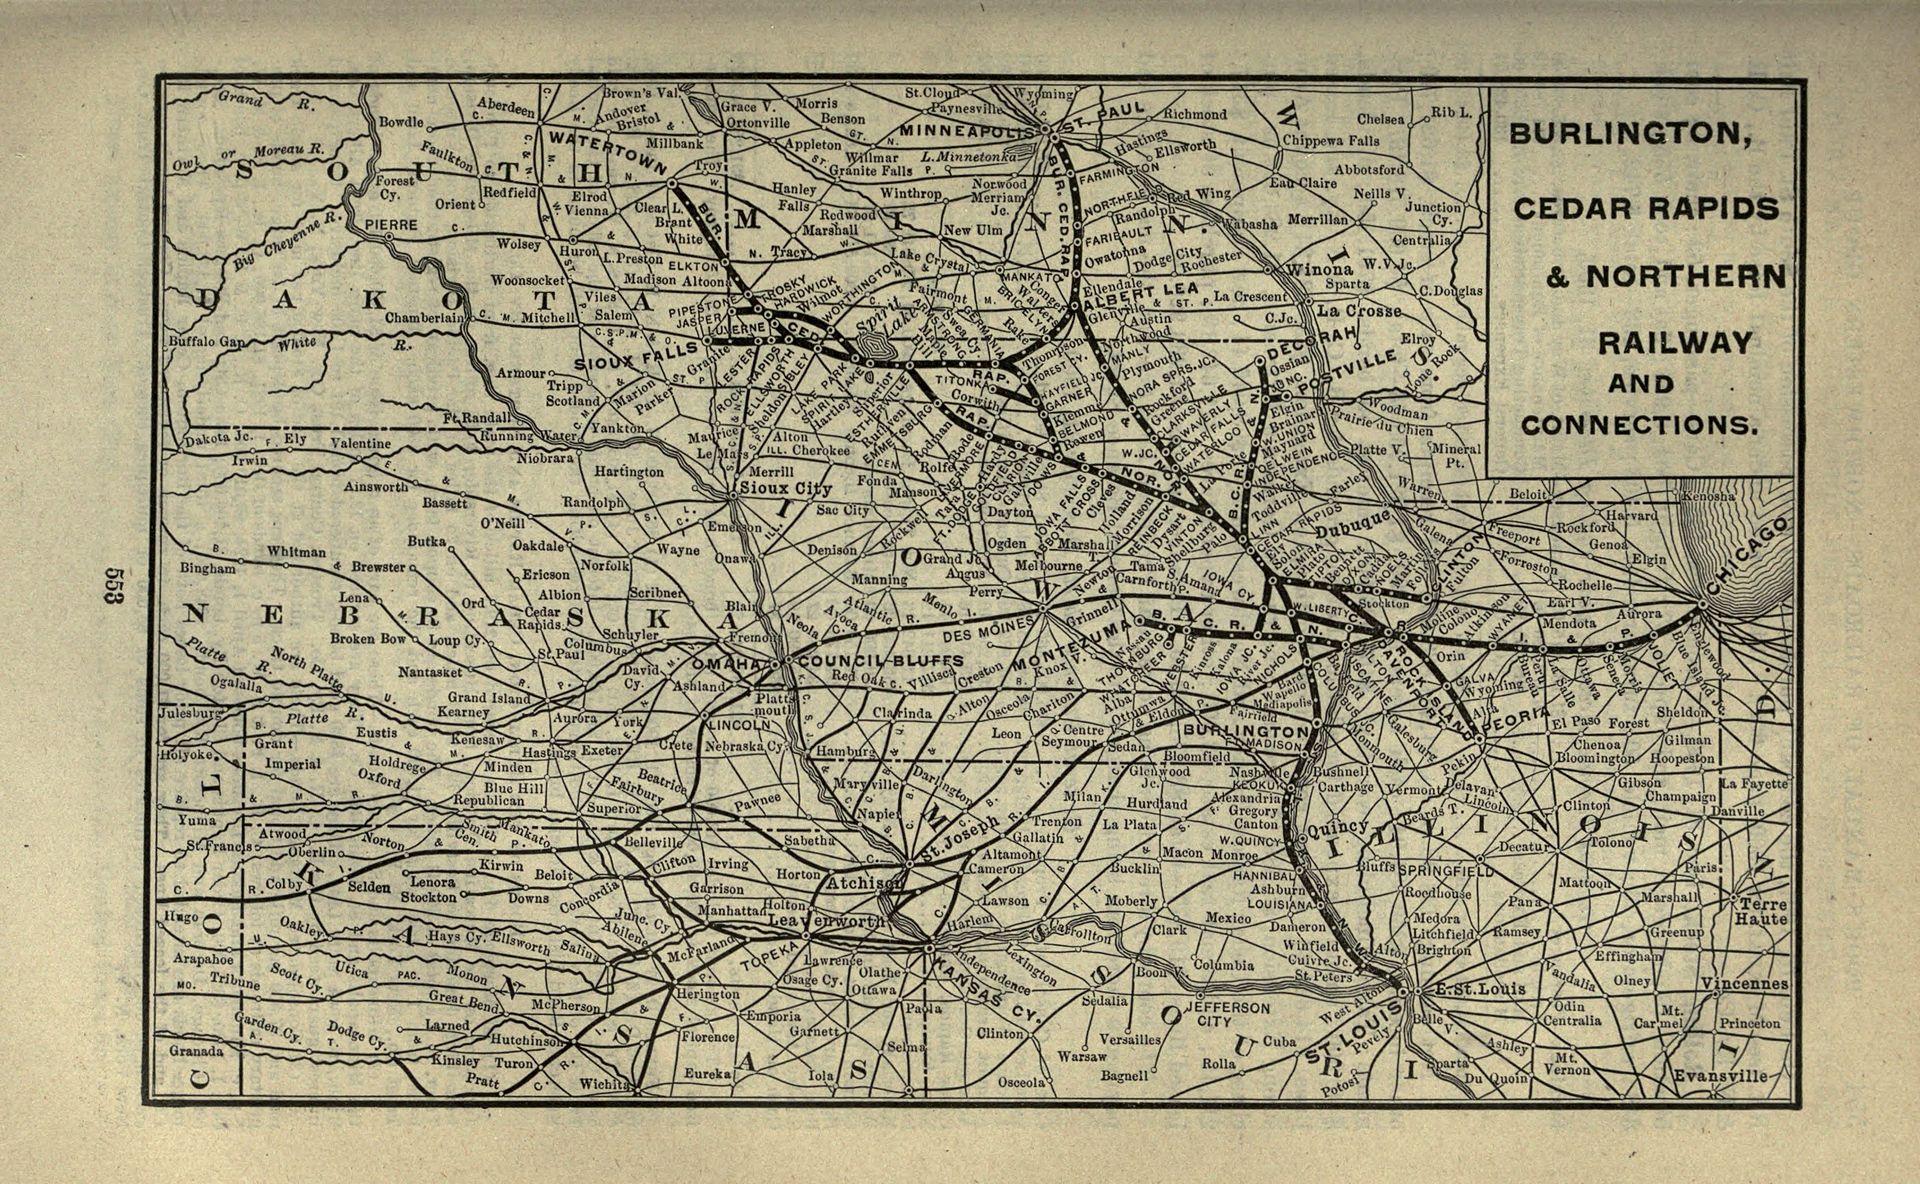 BCR&N Map, 1901